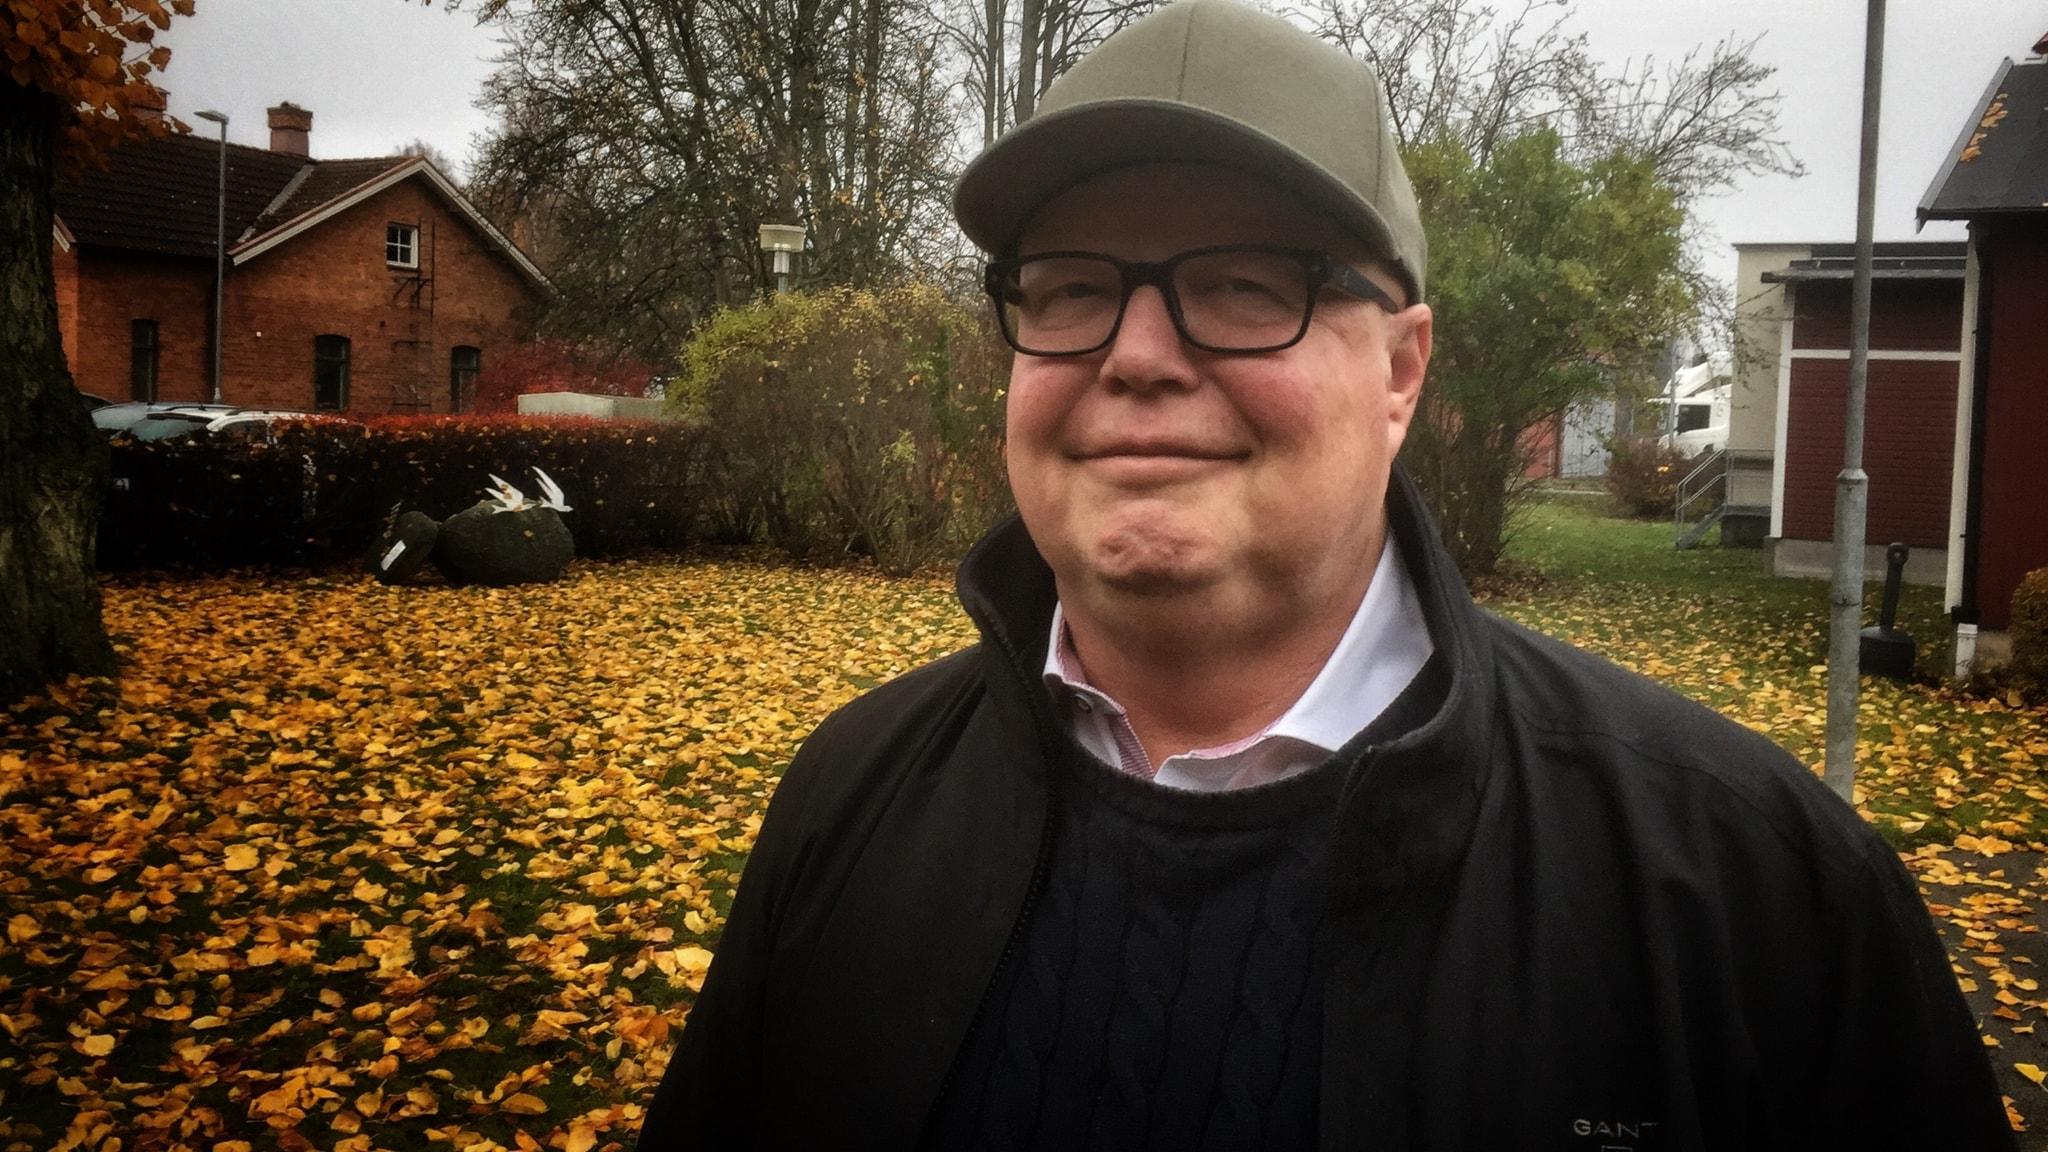 Johannes Hll, Vejbyslttsvgen 49, Vejbystrand | unam.net